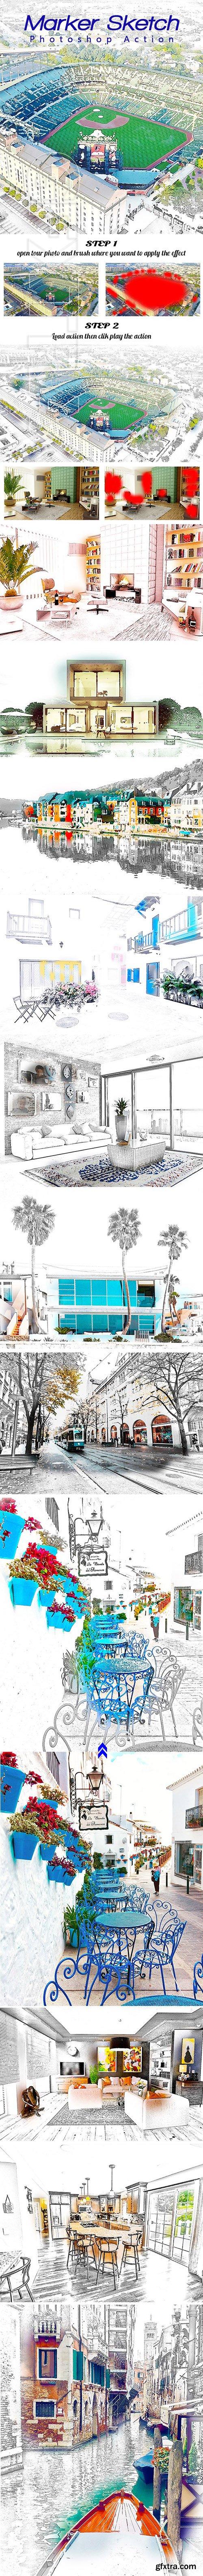 GraphicRiver - Marker Sketch Photoshop Action 24697465